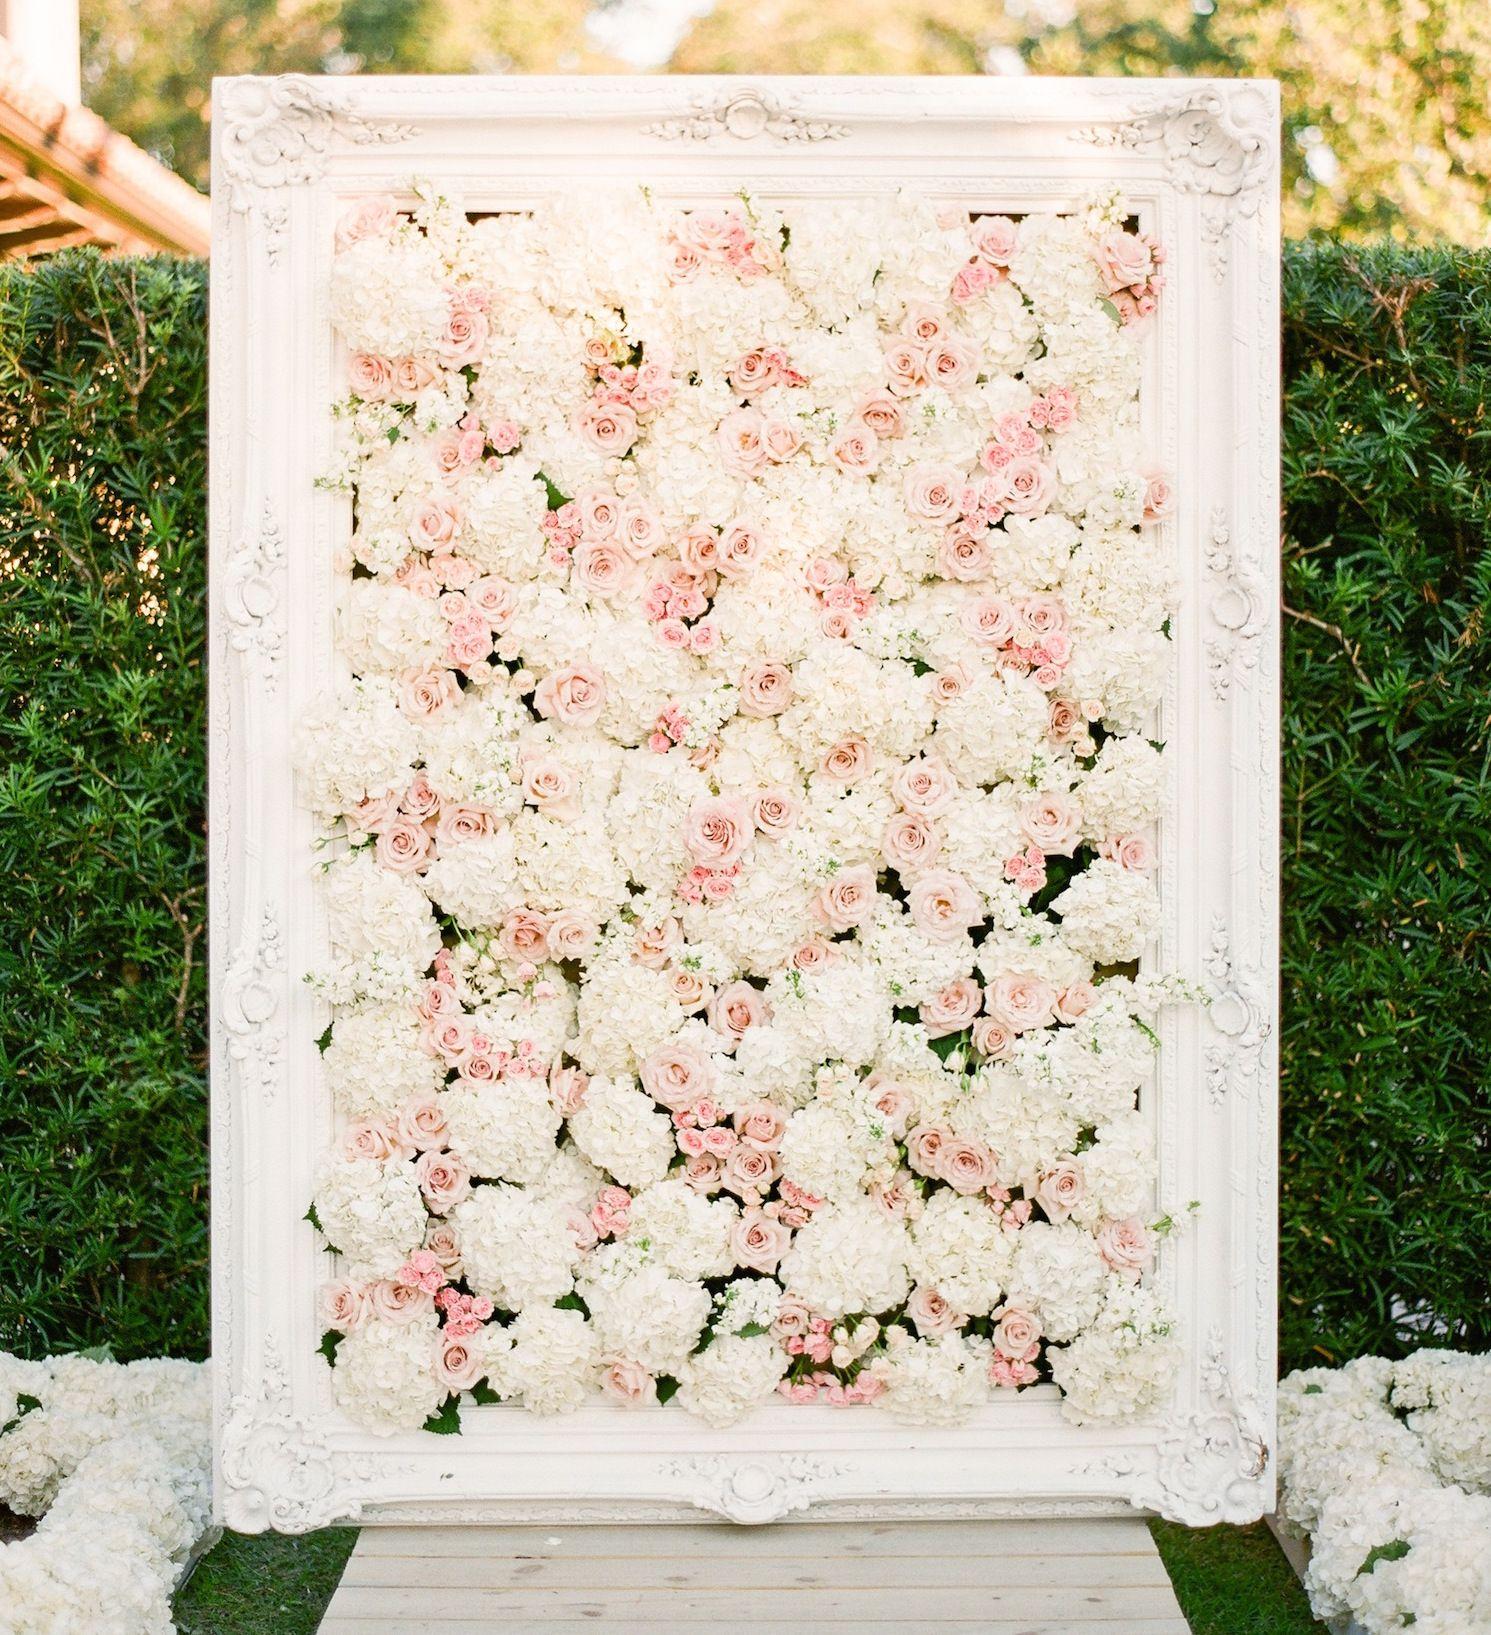 15 Hydrangea Flower Arrangements For Your Wedding Flower Wall Wedding Hydrangea Flower Arrangements Flower Arrangements